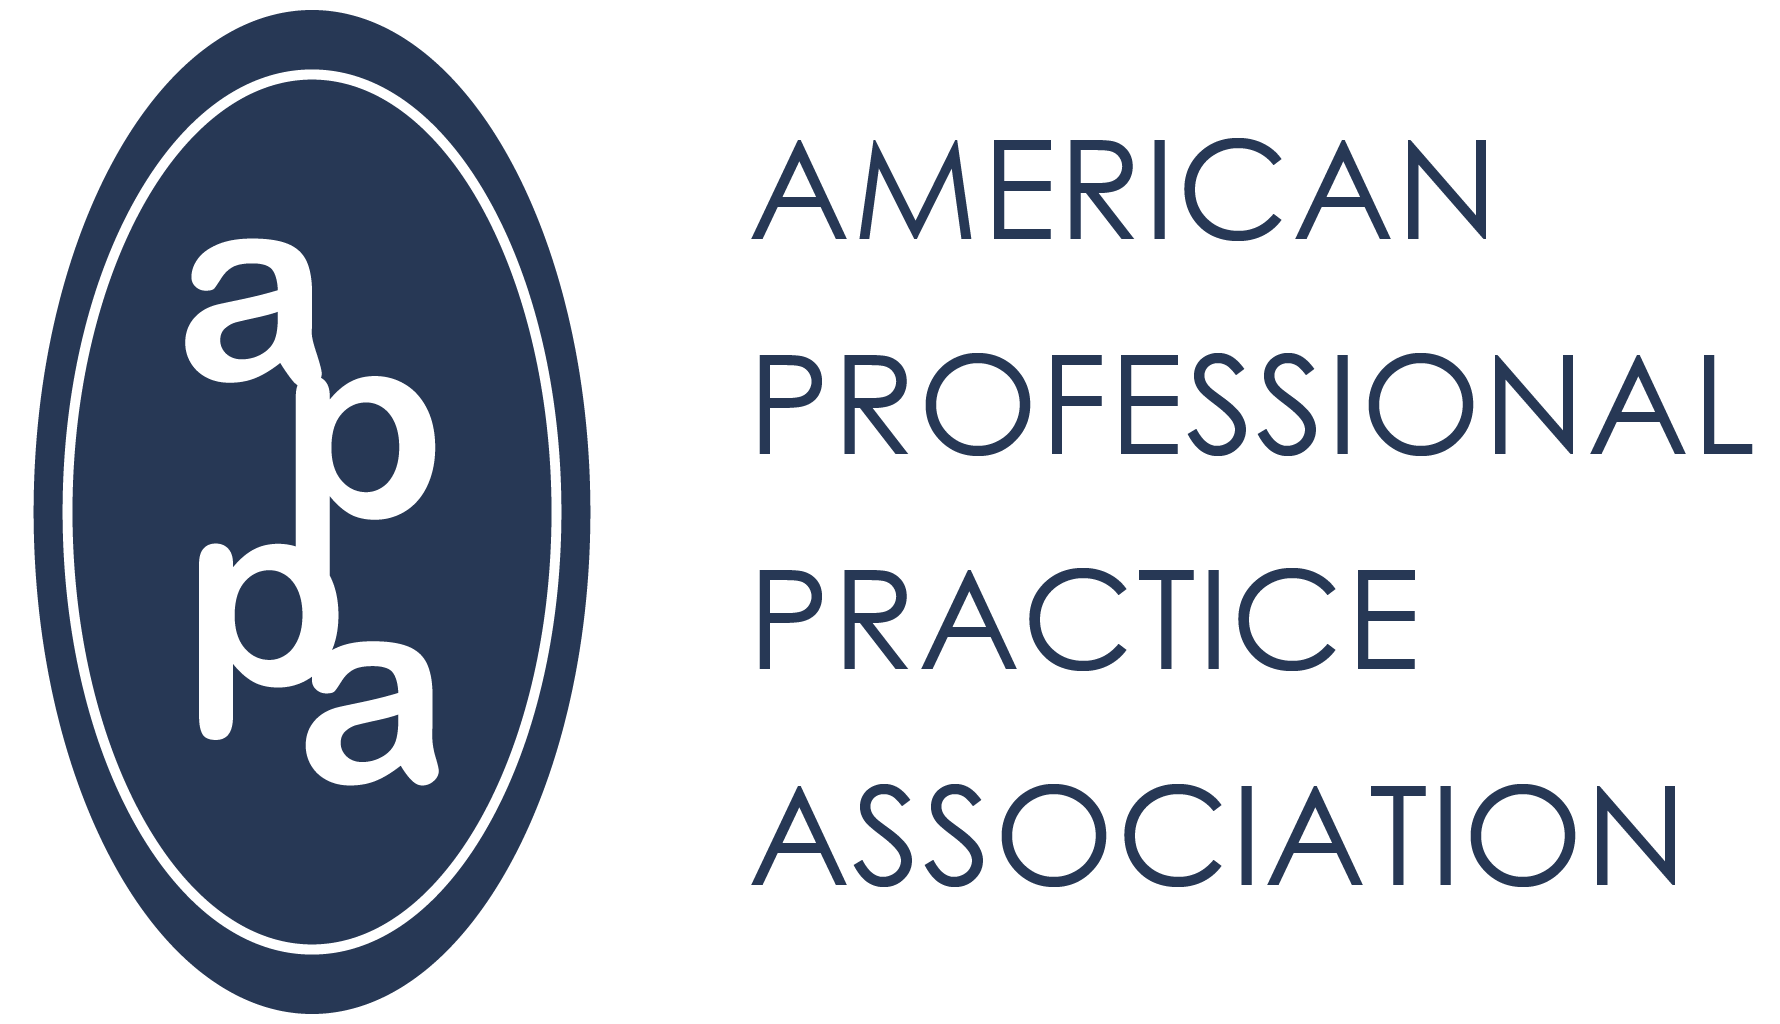 APPA - American Professional Practice Association Logo